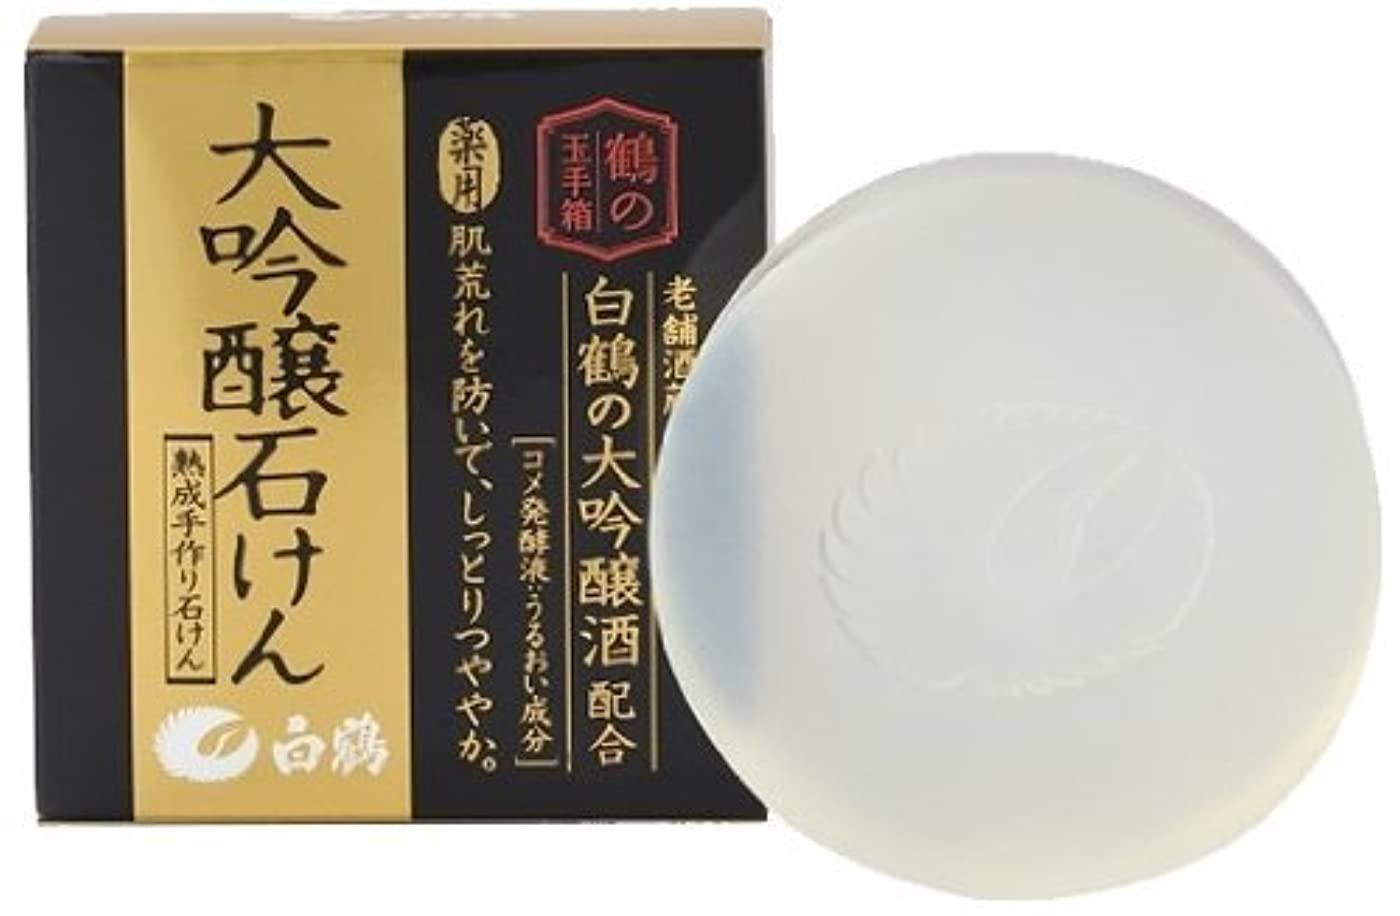 無効地殻食事白鶴 鶴の玉手箱 大吟醸石けん 100g × 10個 (薬用)(医薬部外品)